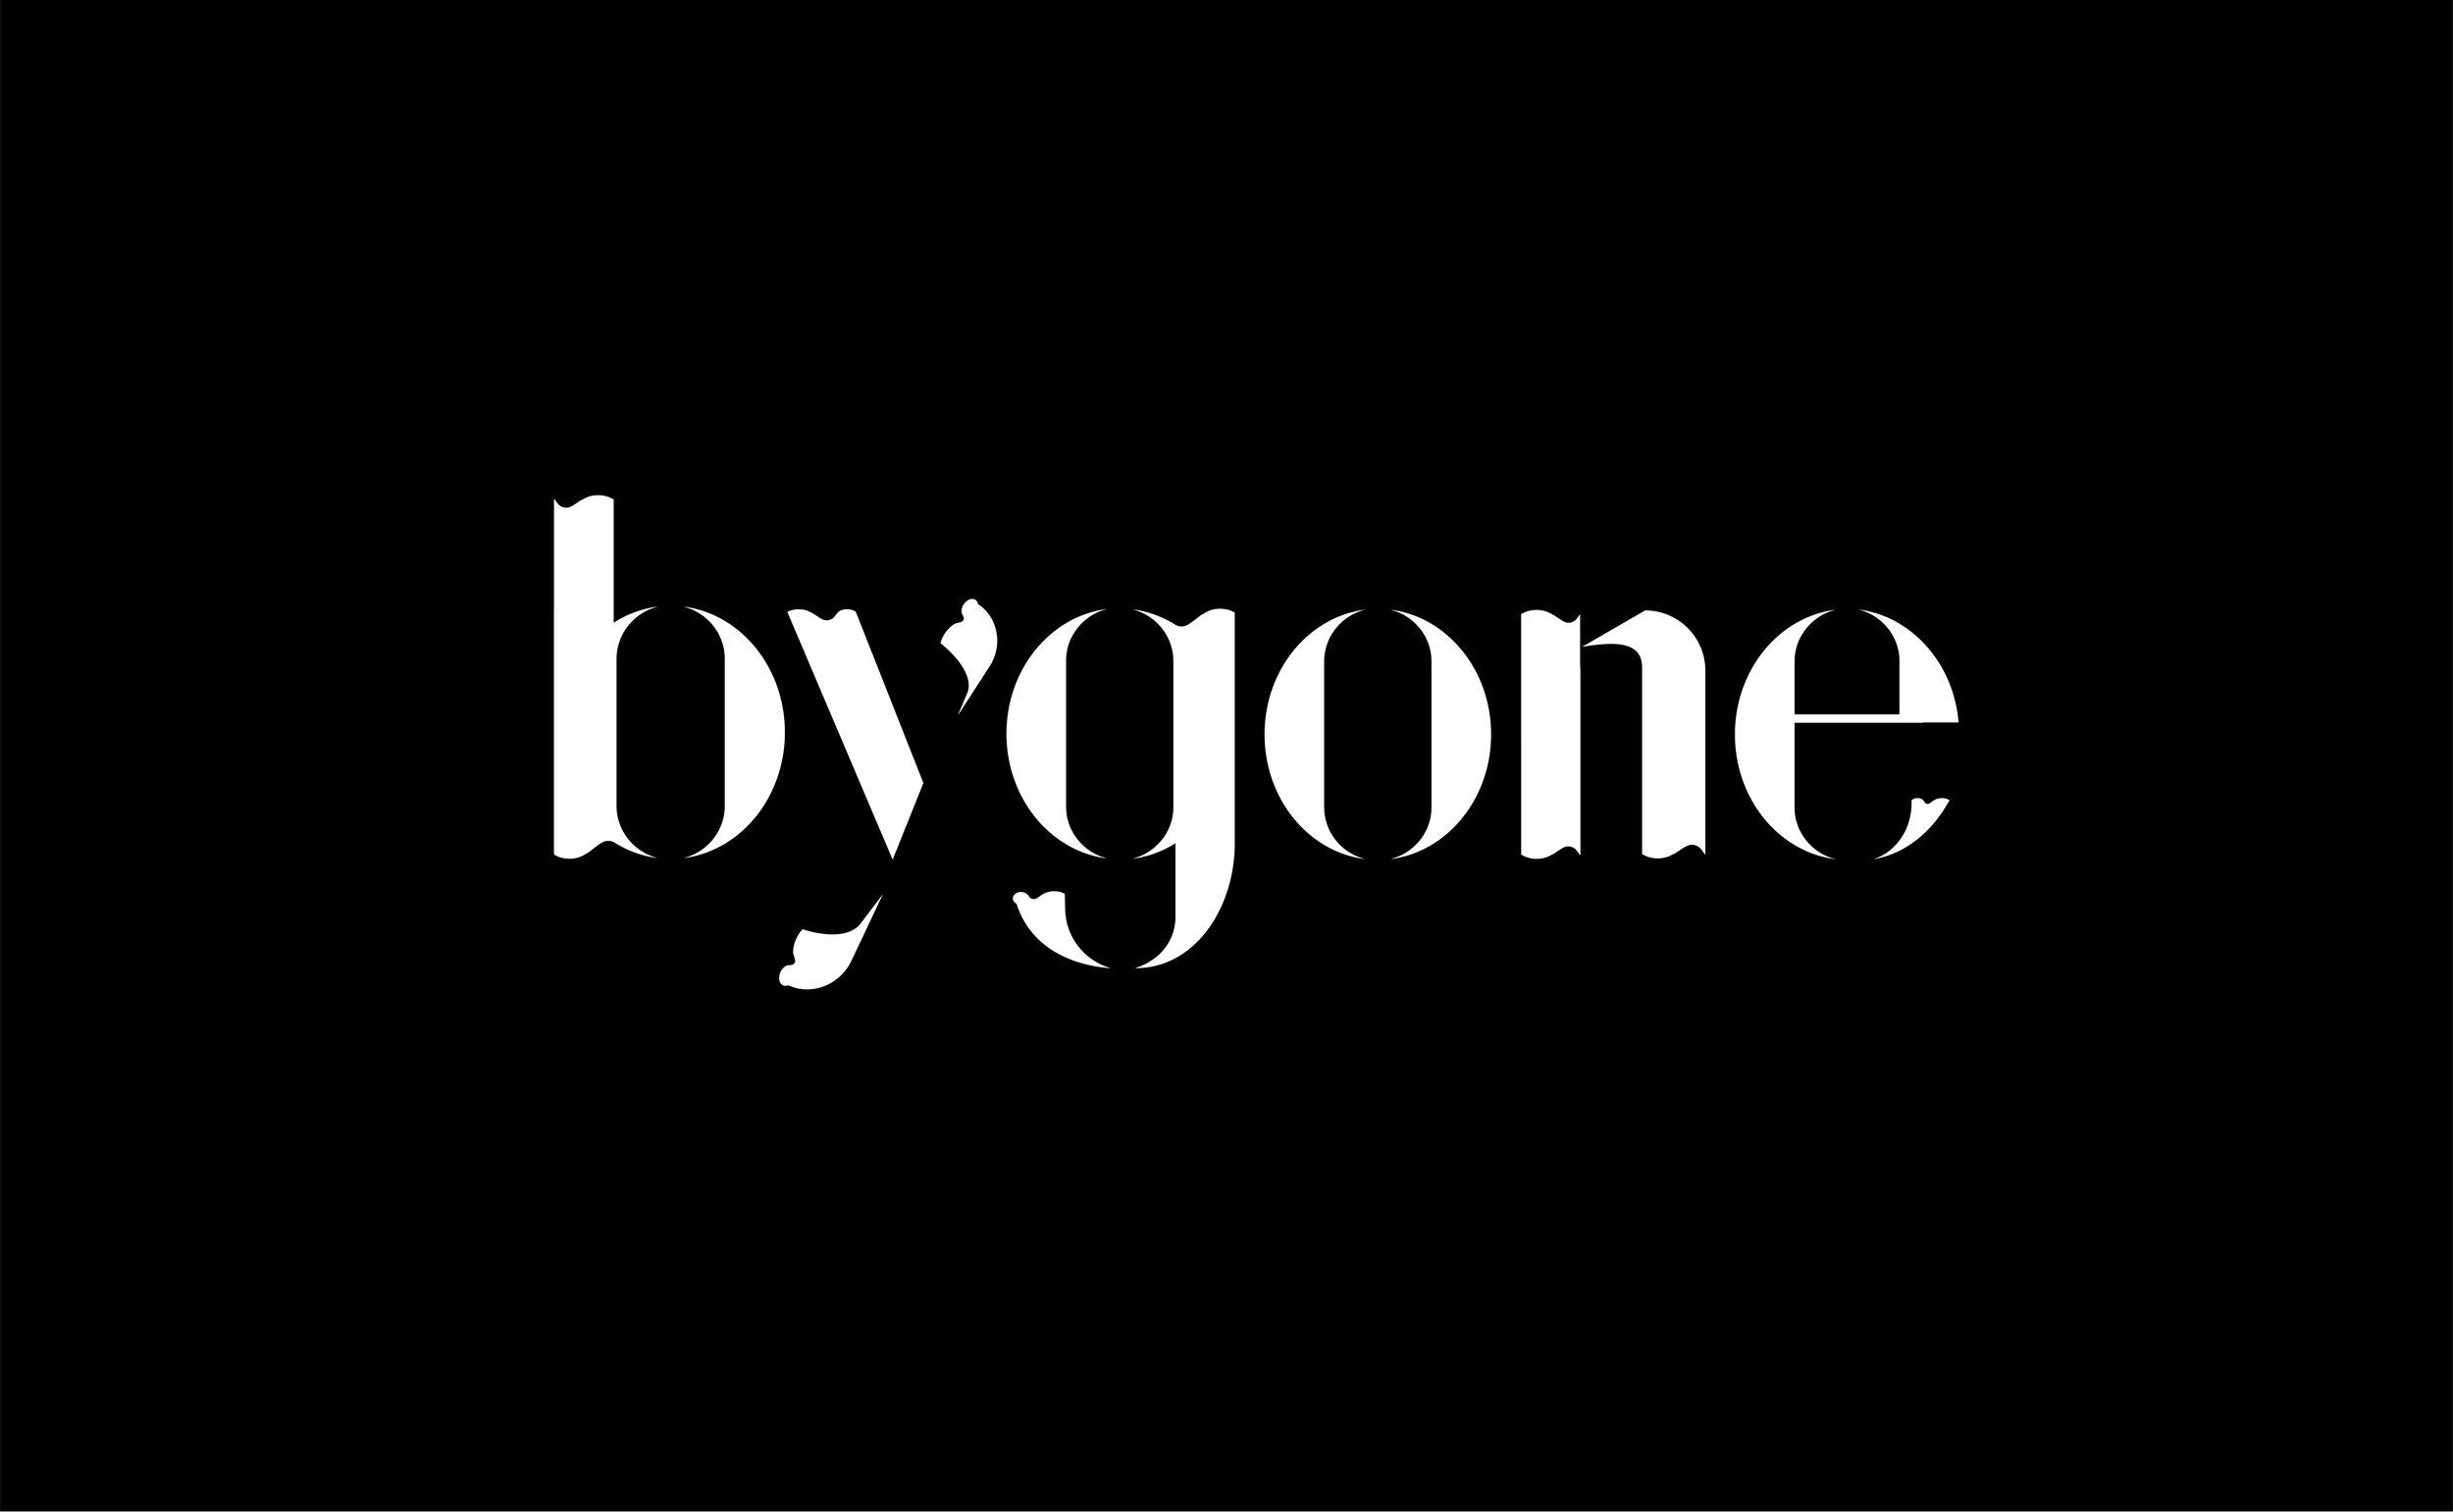 callas typeface rework-14.jpg